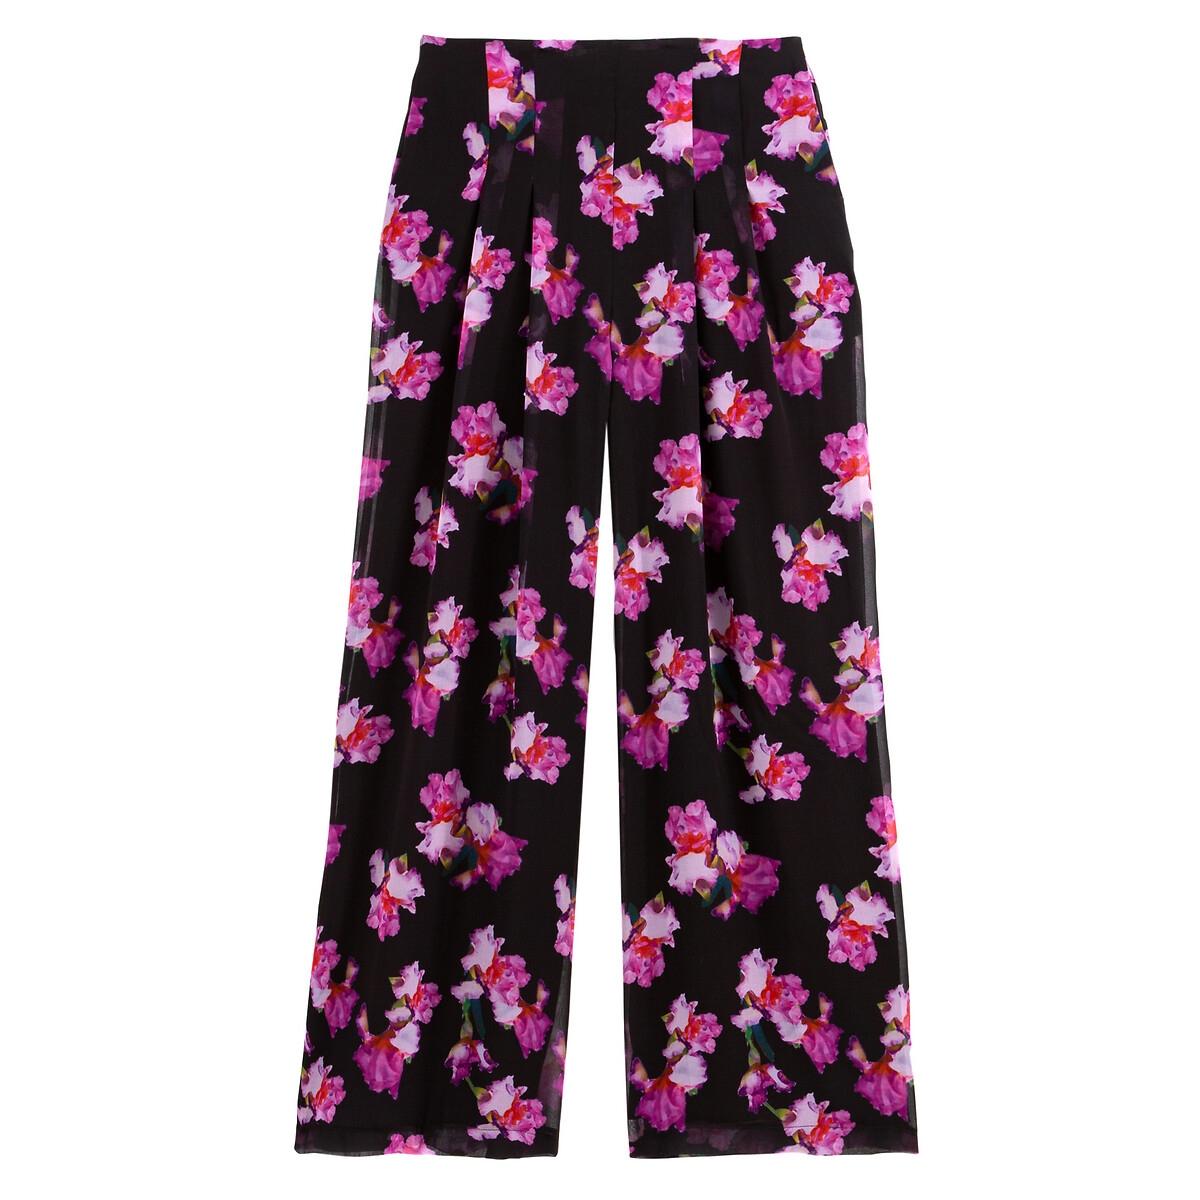 Calças largas, estampado floral